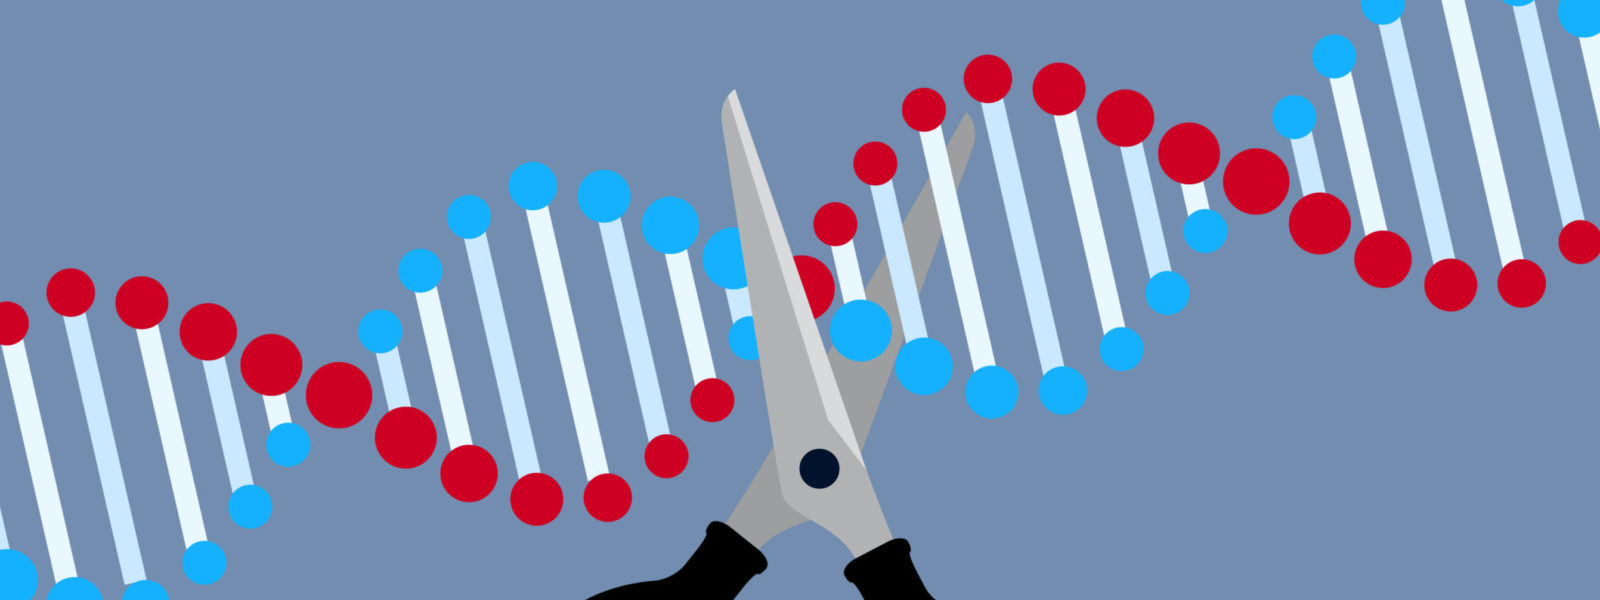 Crispr – gene editing